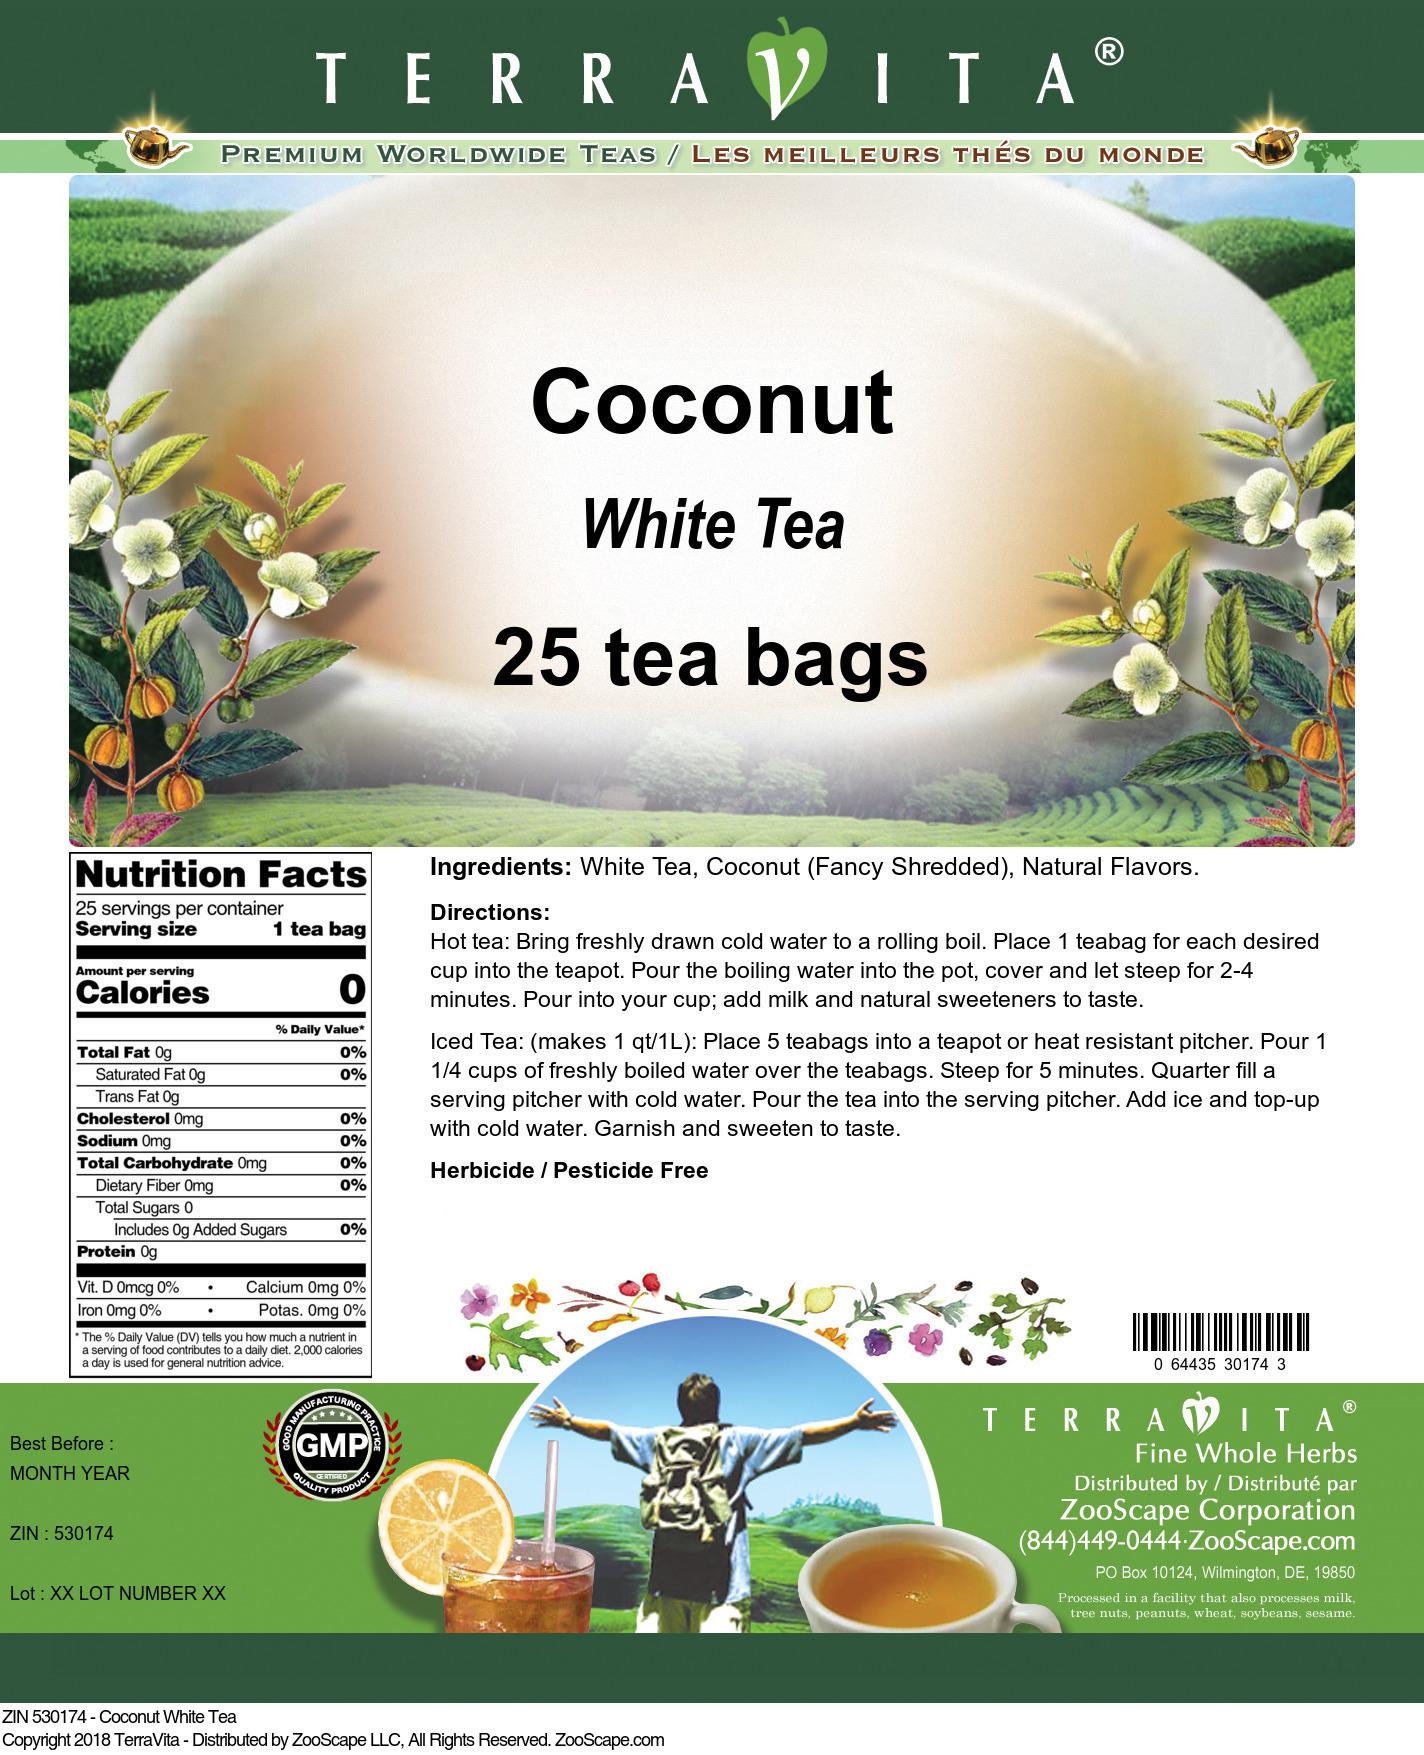 Coconut White Tea